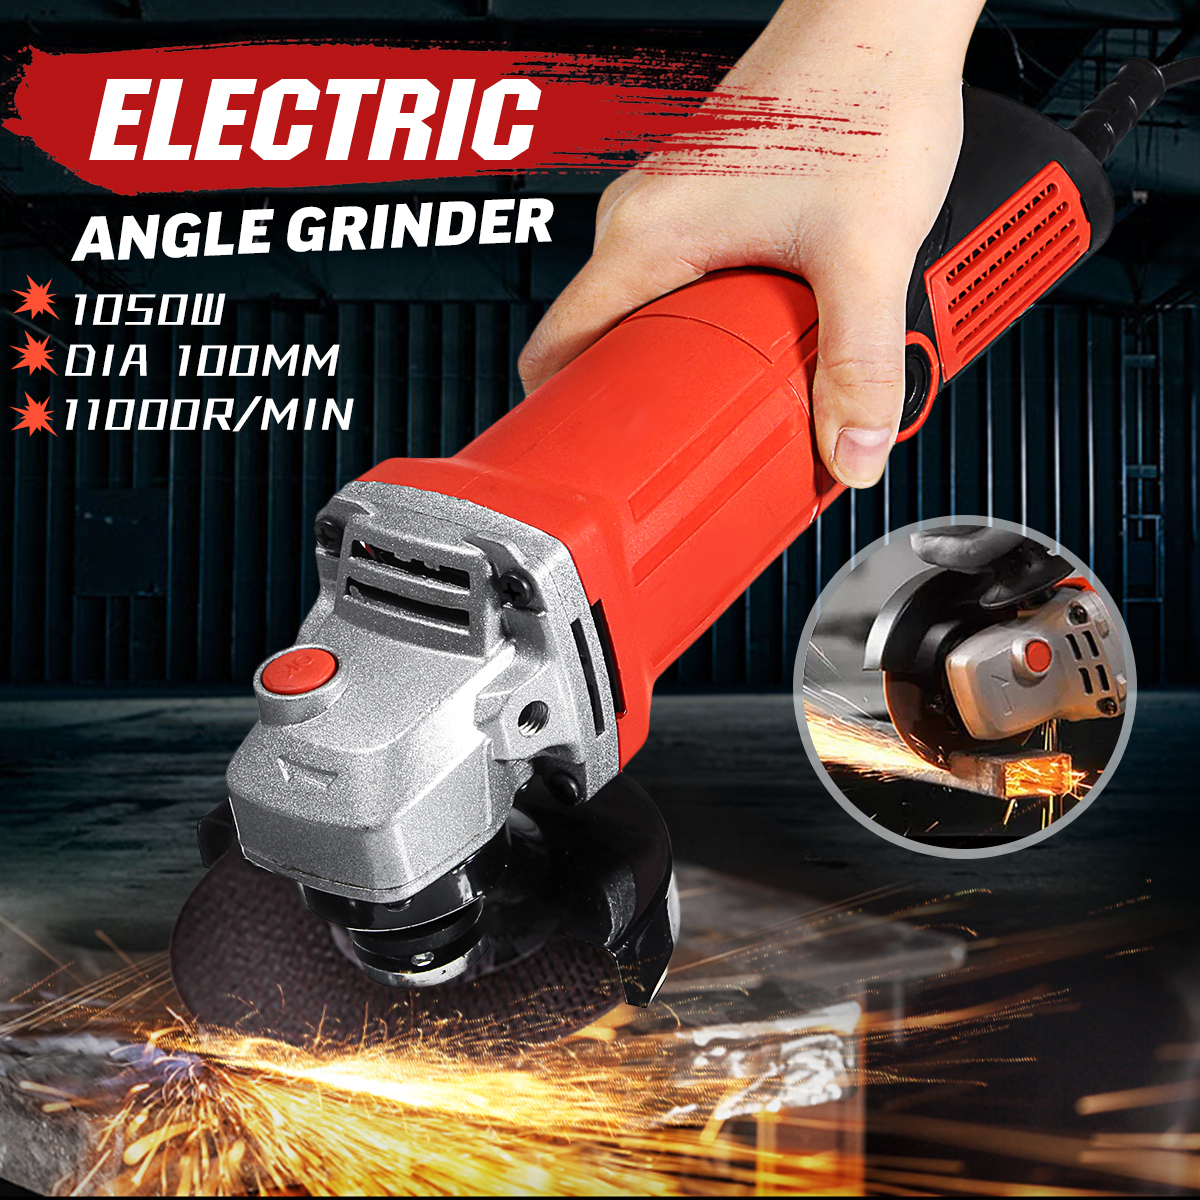 1600W Peaks 220-240V Angle Grinder 11000r/min Electric Grinder Polishing Polisher Grinding Machine Cutting Woodworking Tool